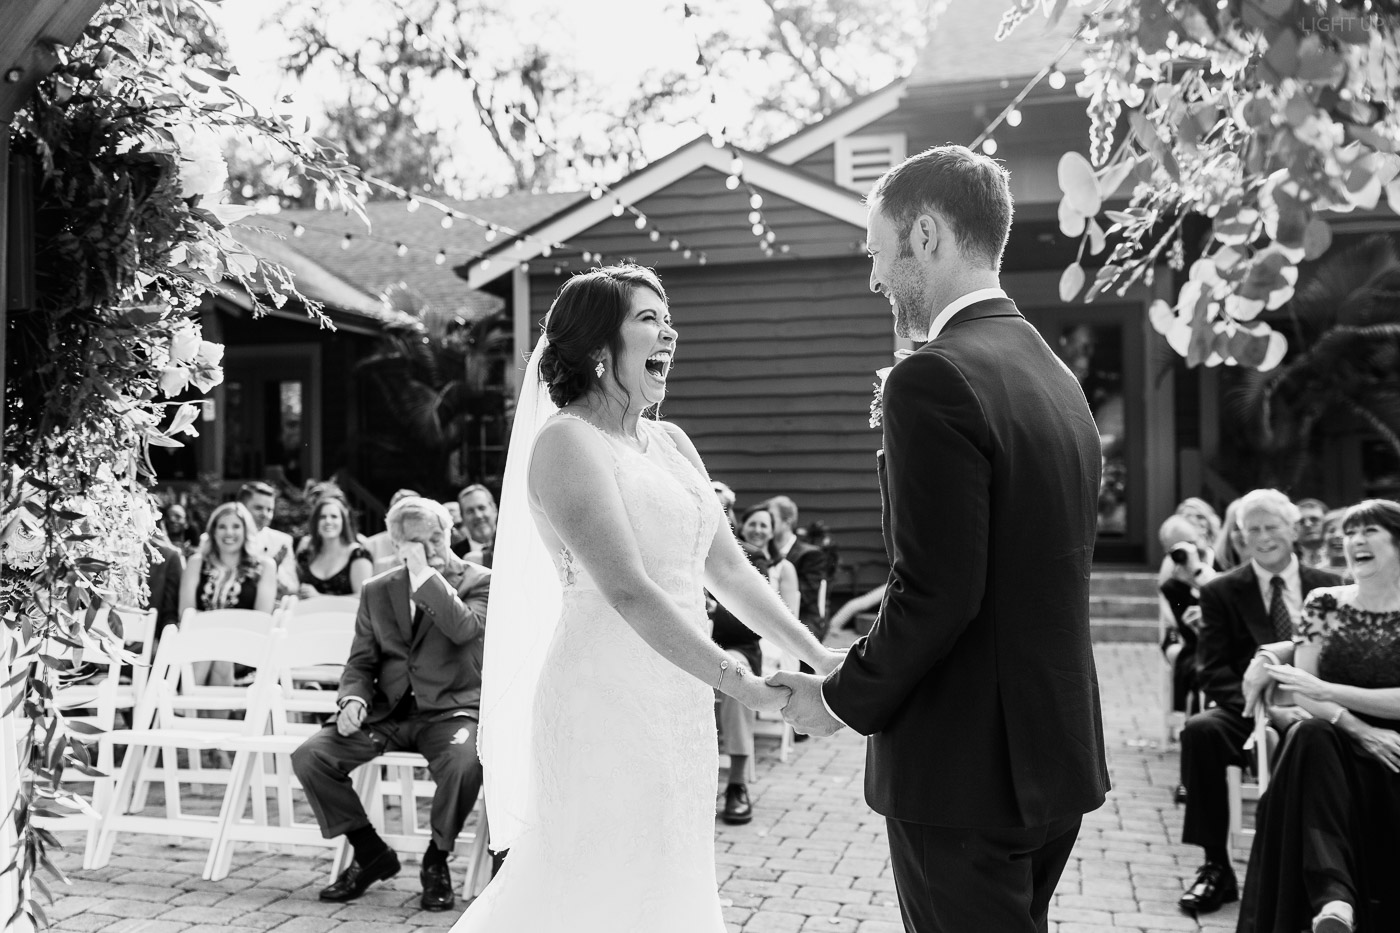 hstoric-dubsdread-wedding-orlando-15.jpg